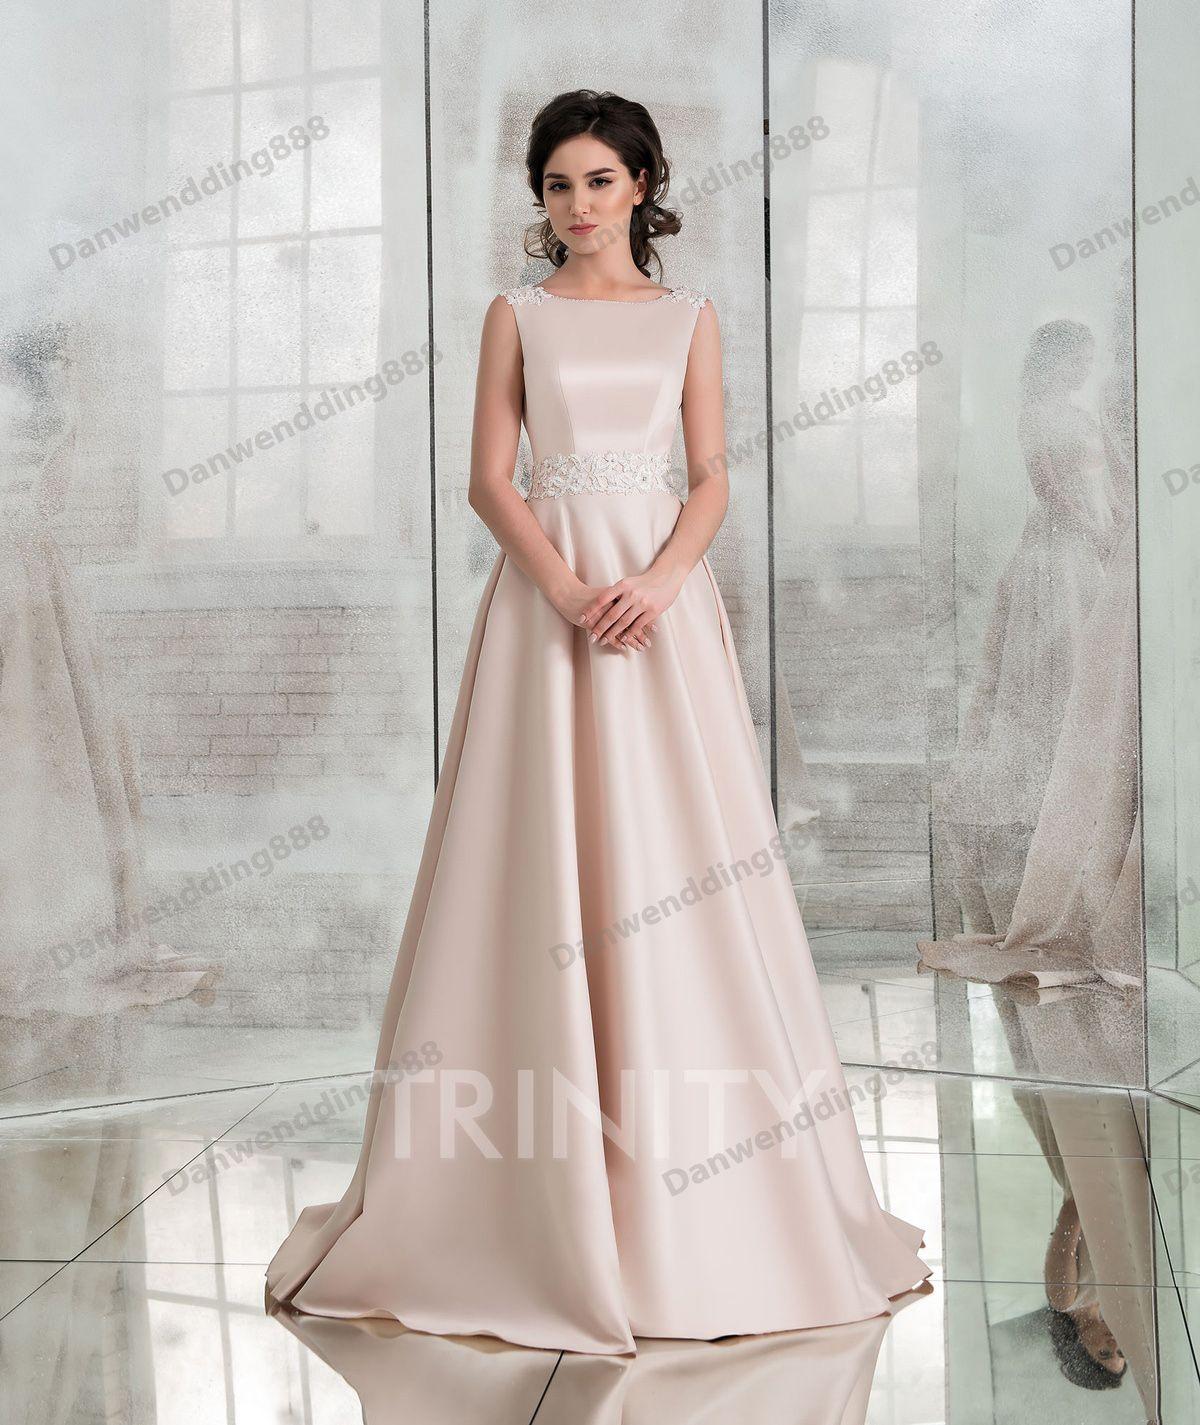 Beauty Champagne Scoop Satin Applique Beads A-Line Wedding Dresses Bridal Pageant Dresses Wedding Attire Dresses Custom Size 2-16 ZW712164